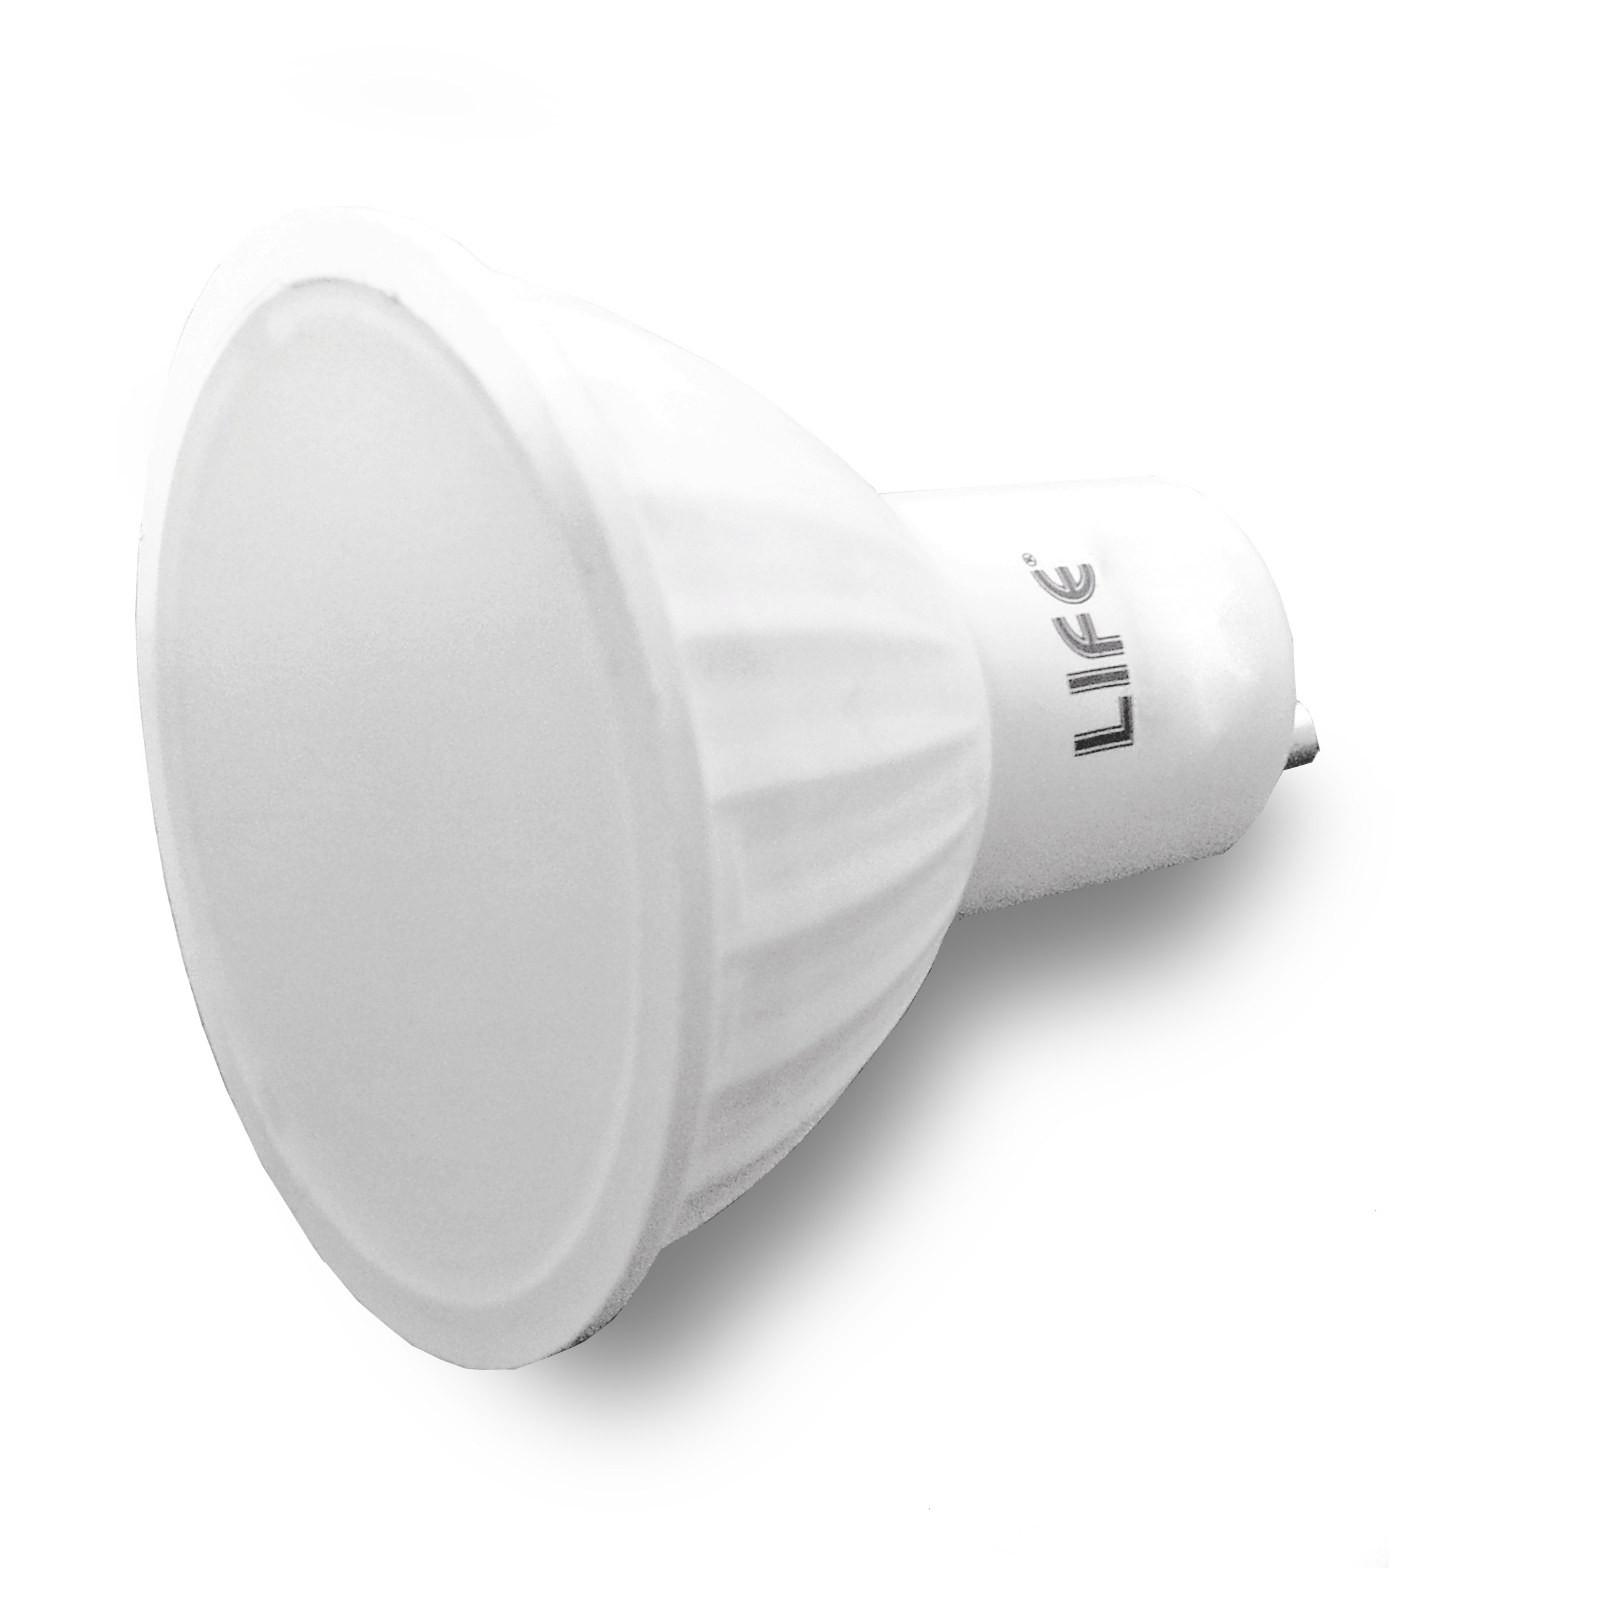 LAMPADA LAMPADINA FARETTO A LED ATTACCO GU10 LUCE CALDA 5 WATT LIFE 380 LUMEN Vultech Life AMC ...